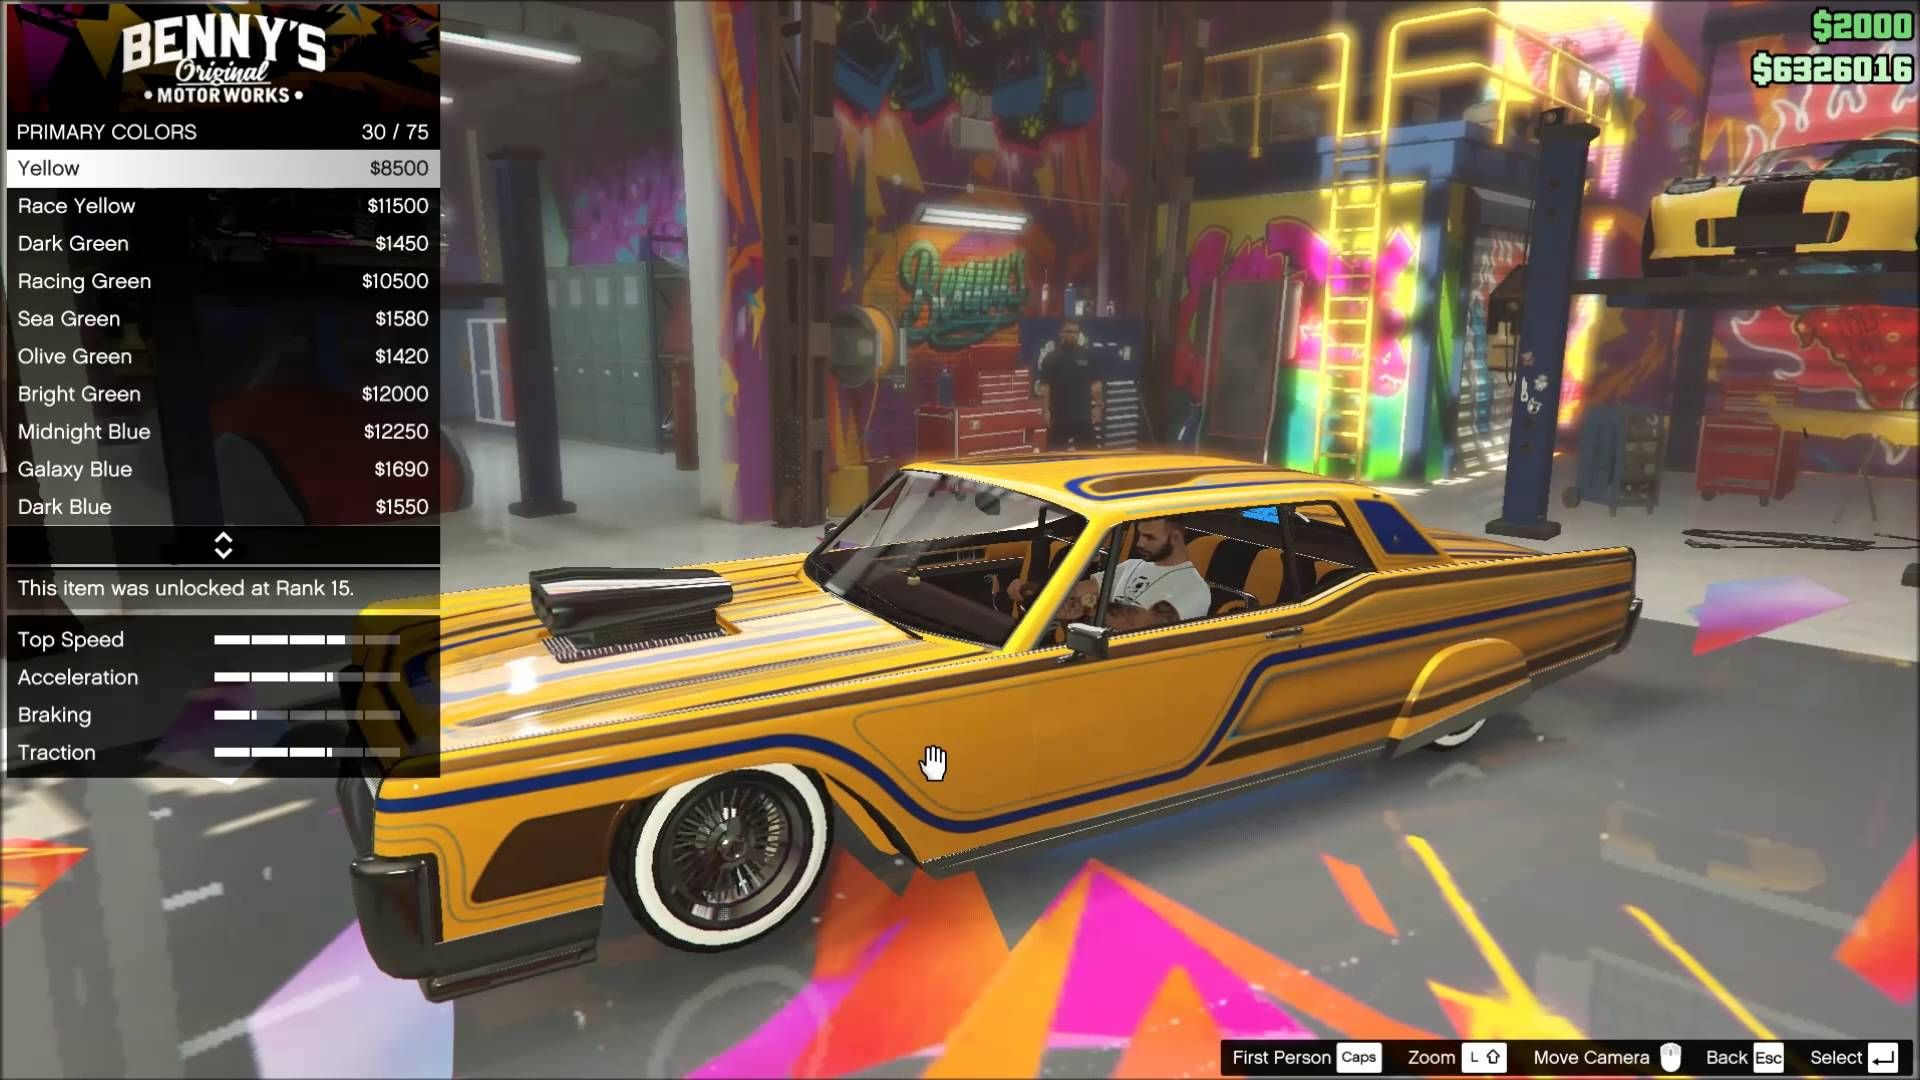 GTA V Online NEW !!! BENNY'S Original MOTOR WORK on Vapid